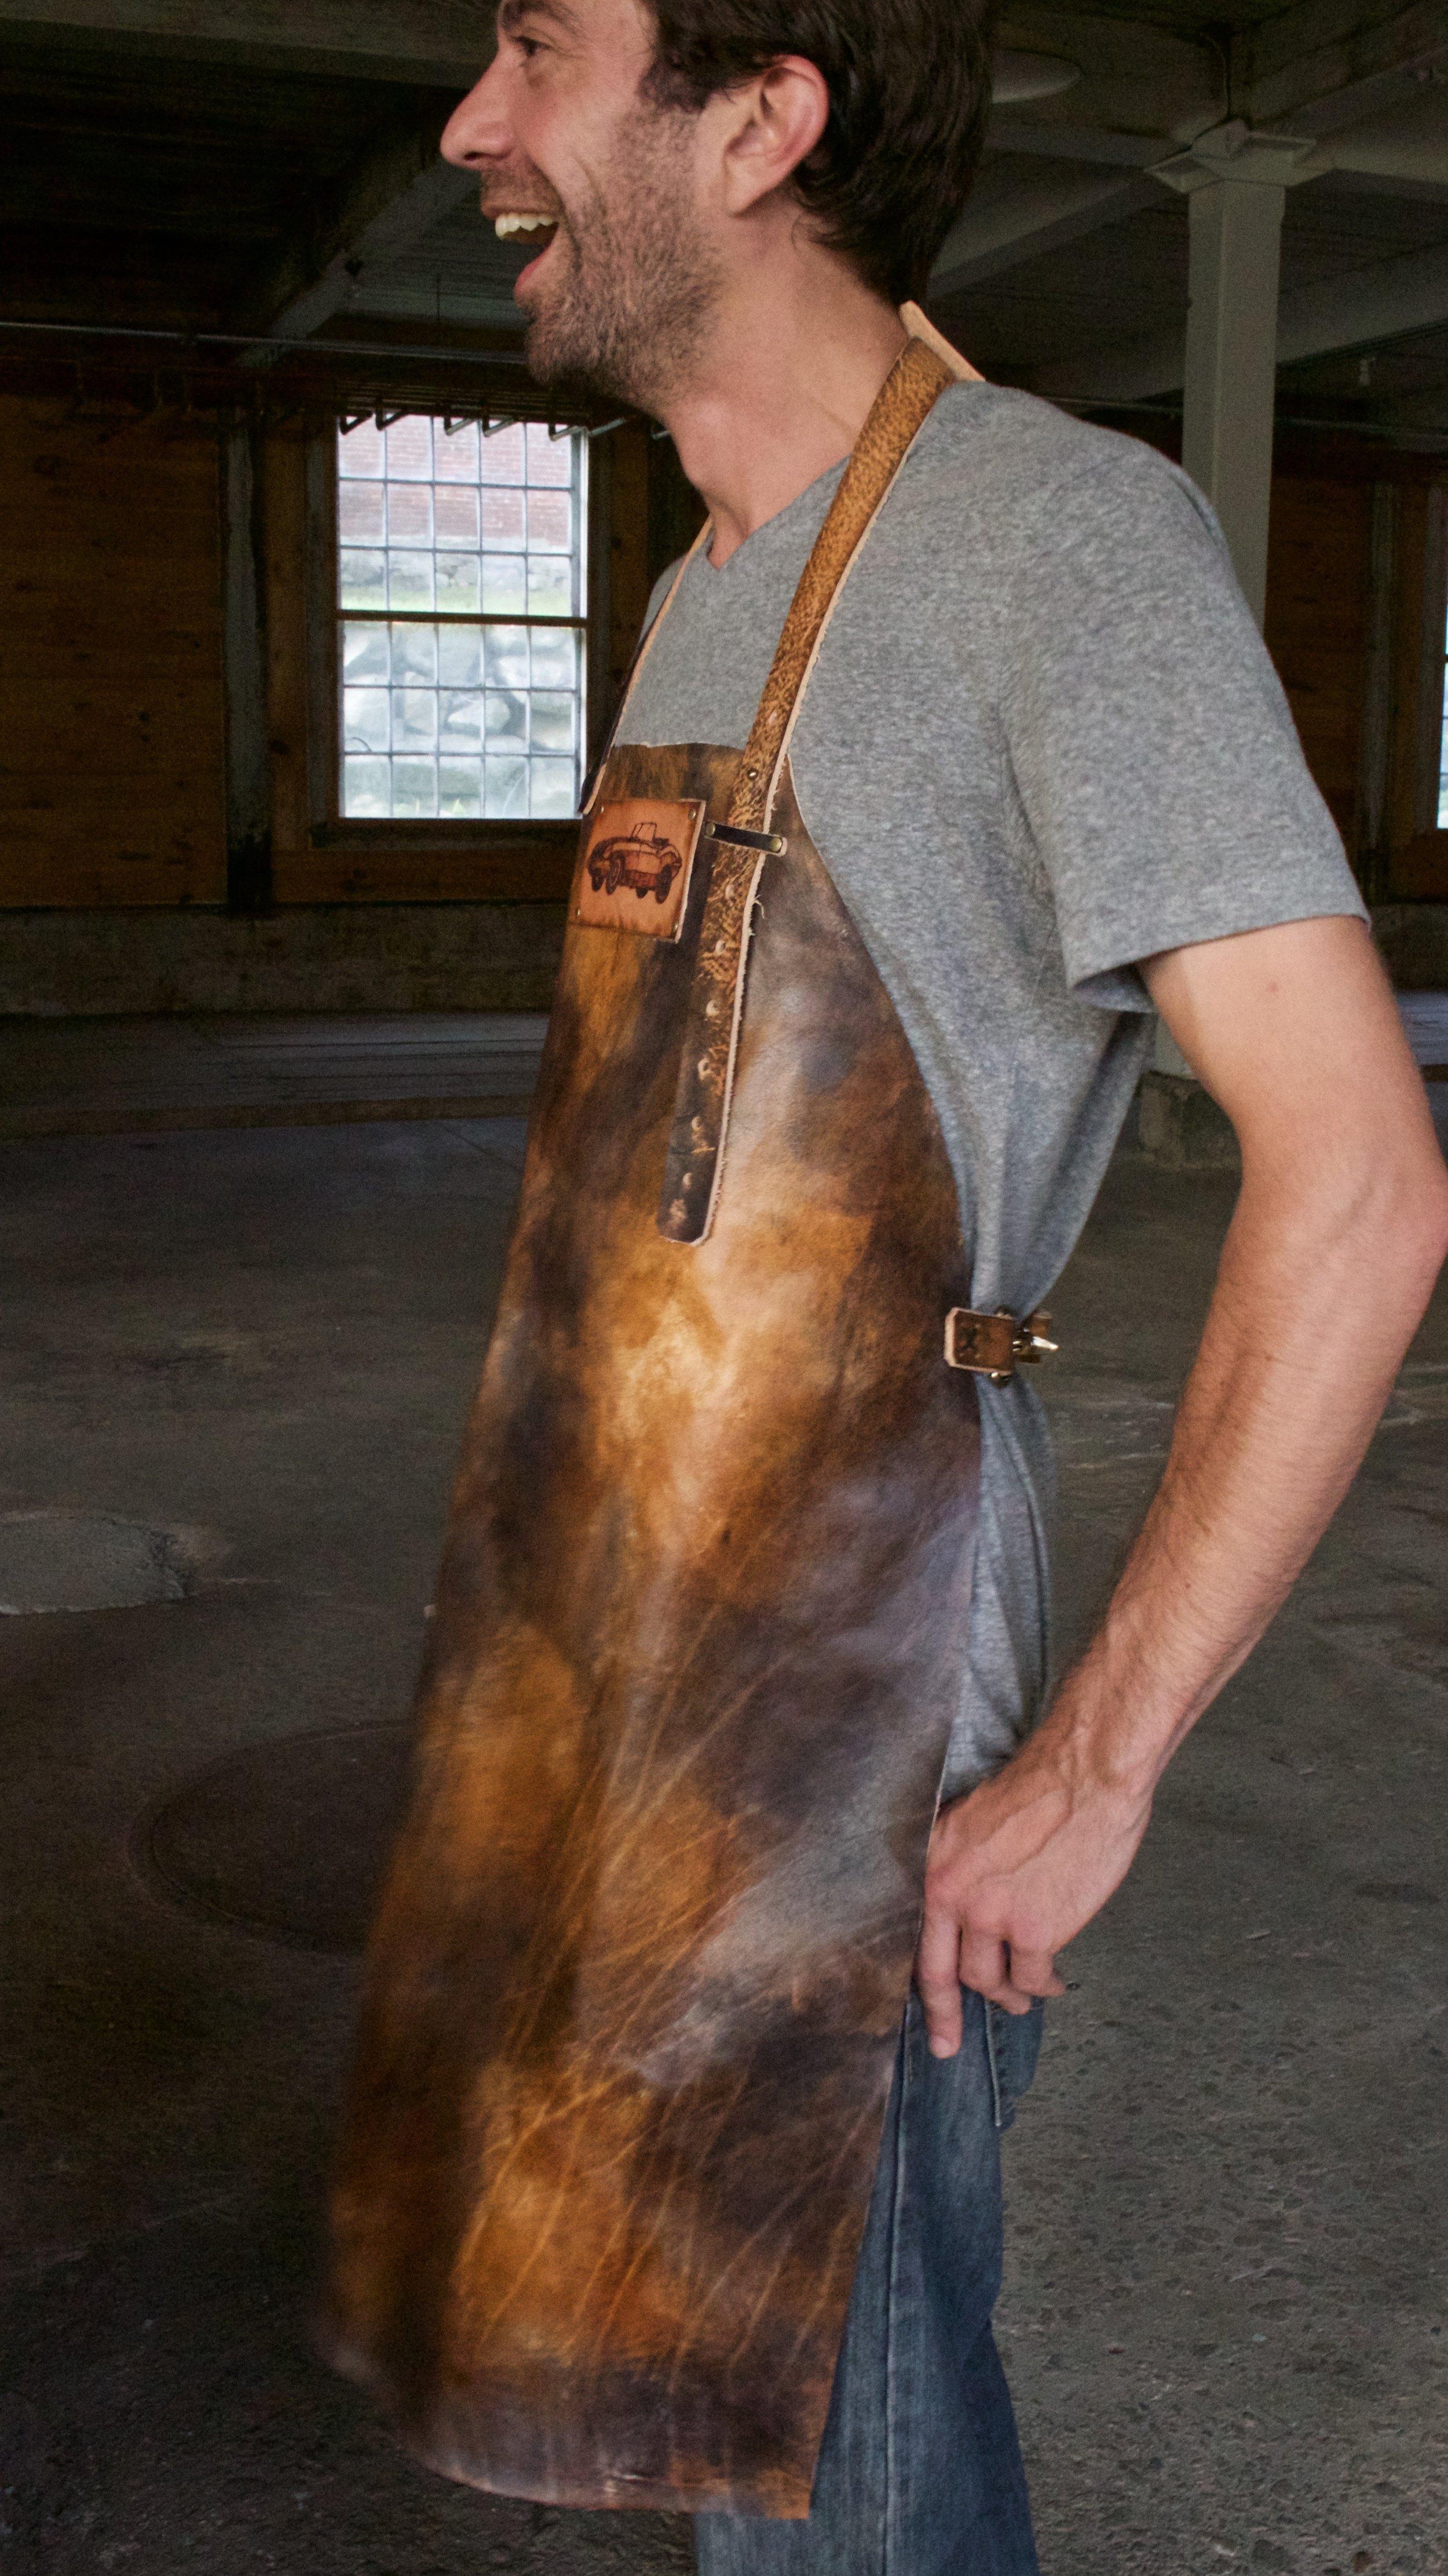 chef apron with car 8.jpg